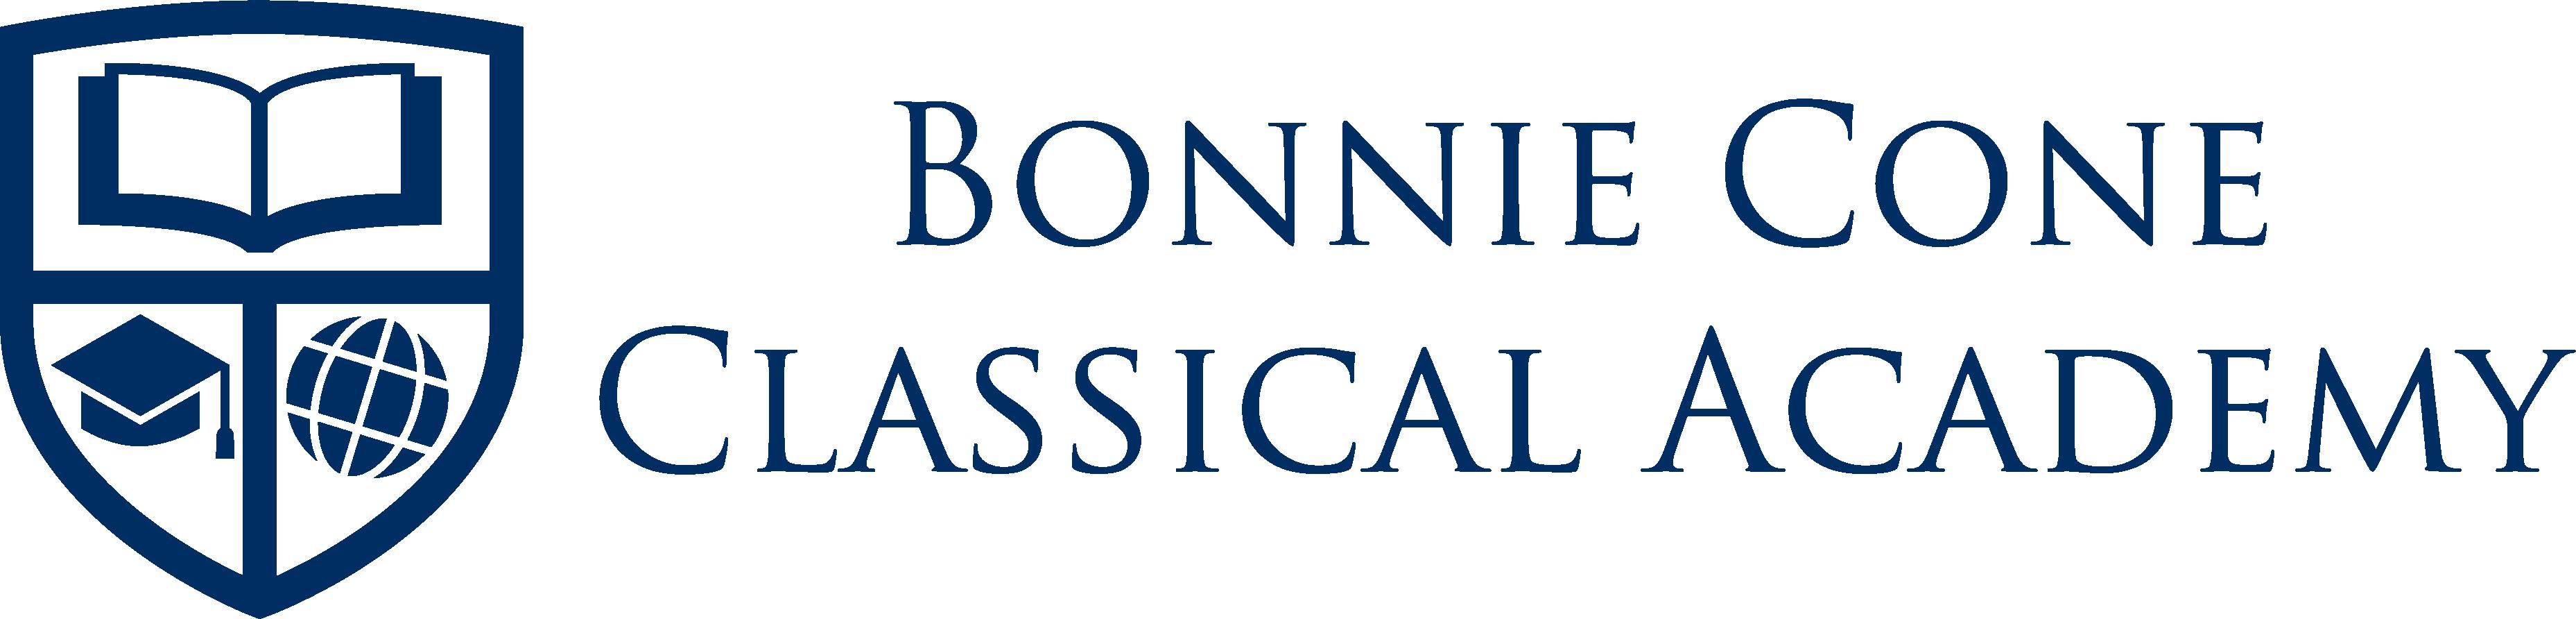 Bonnie Cone Classical Academy logo